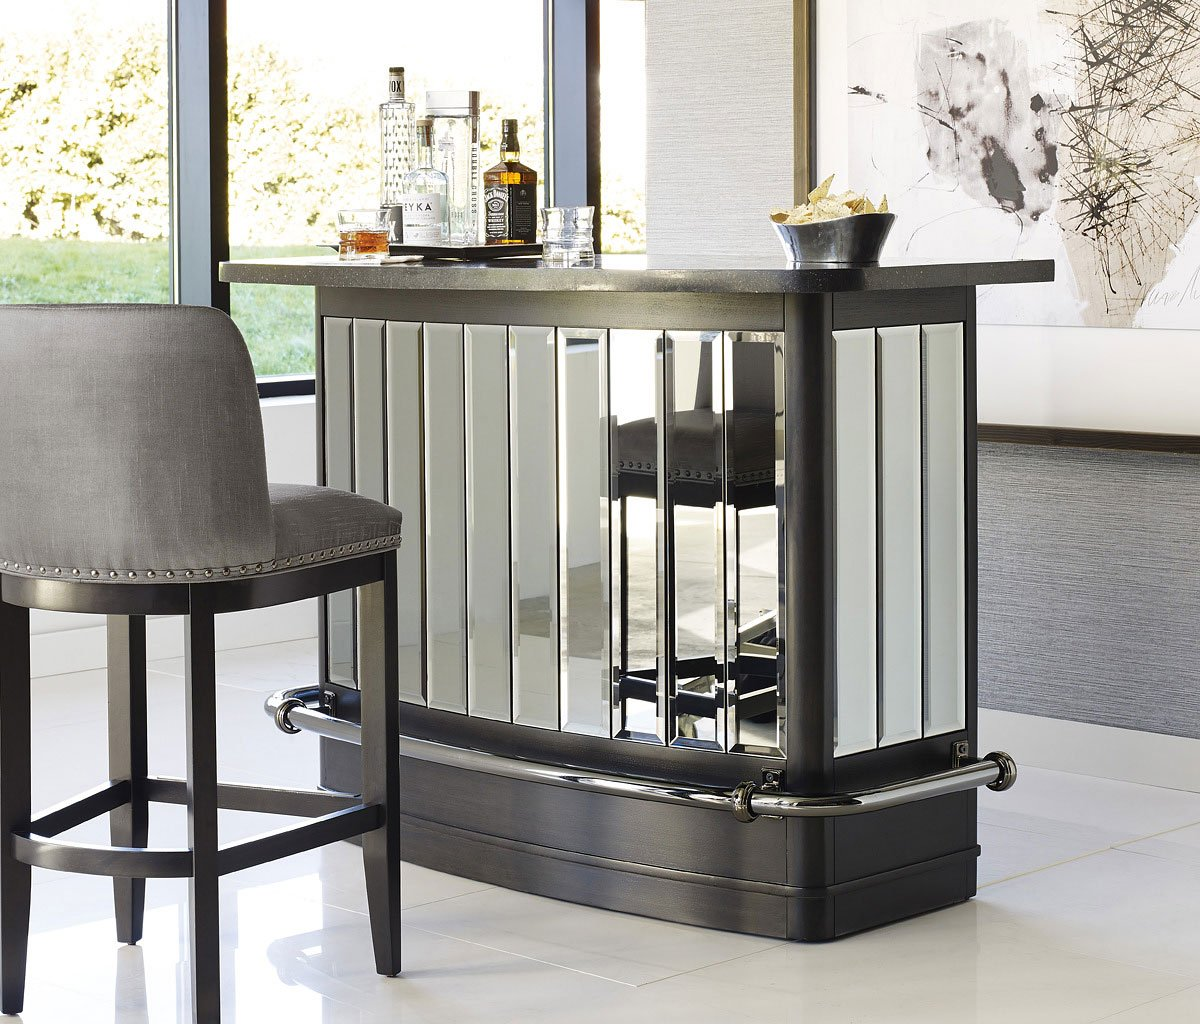 Silverton Sound Home Bar Set Pulaski Furniture